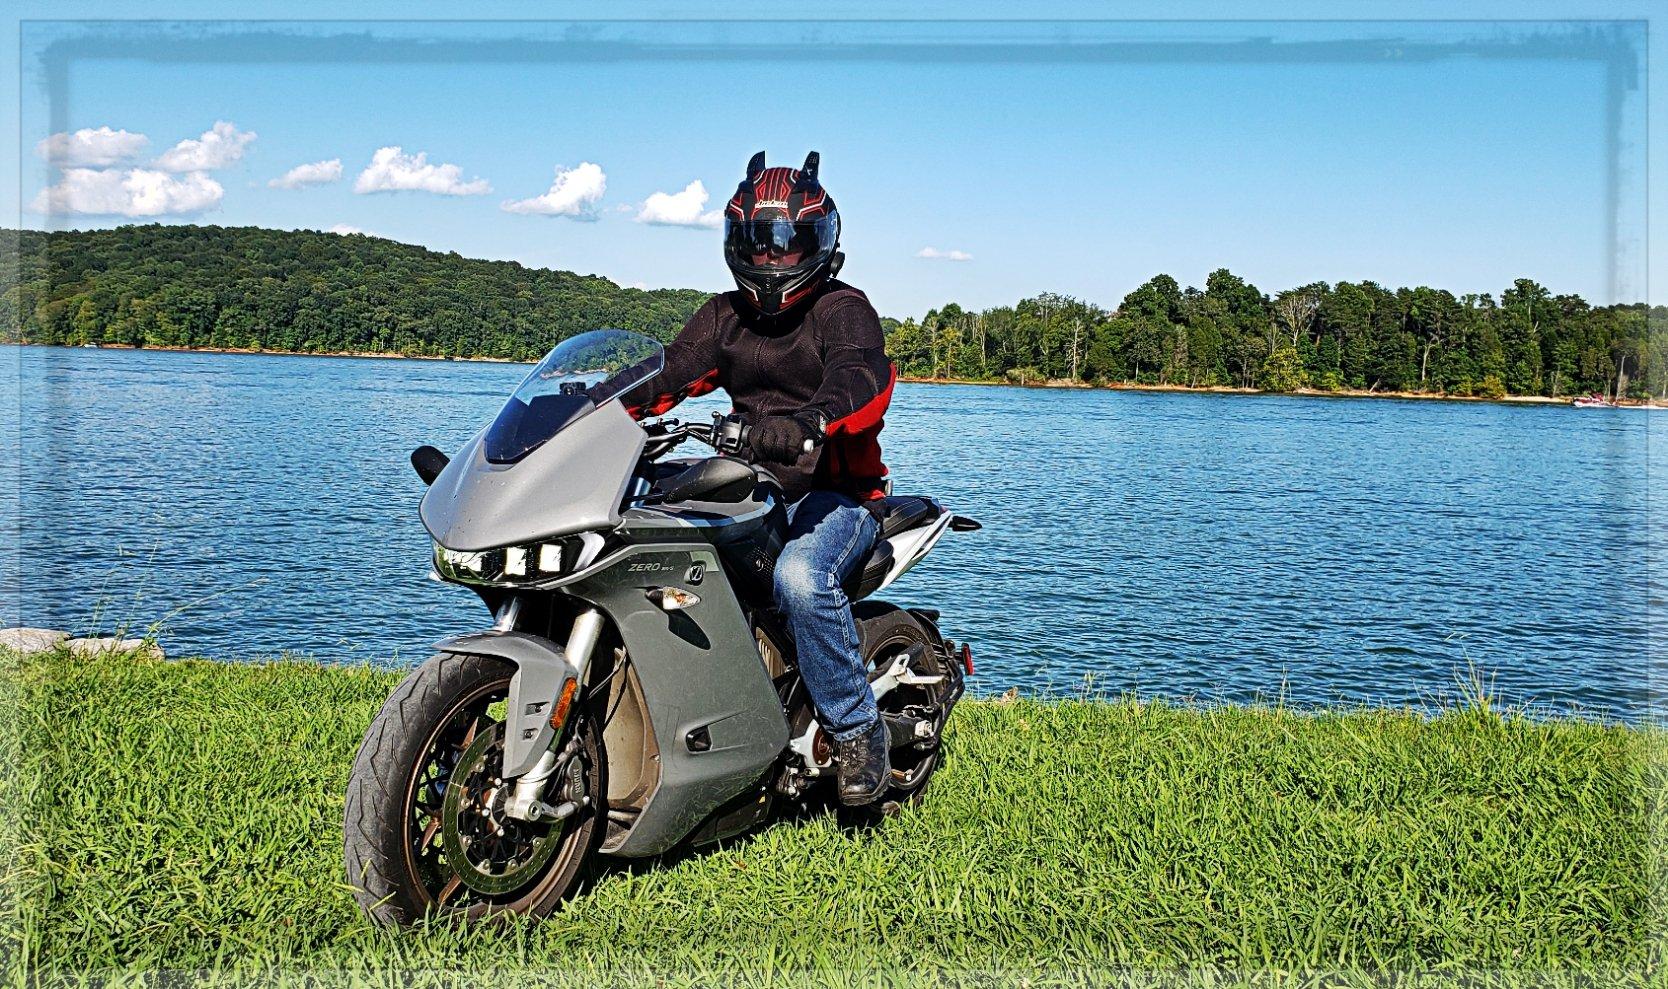 zeromotorcycles-zerosrs-evmotorcycles-electricvehicles-electricmotorcycle-httpst-cofi3myvgcfg-httpst-co3n226j6rli